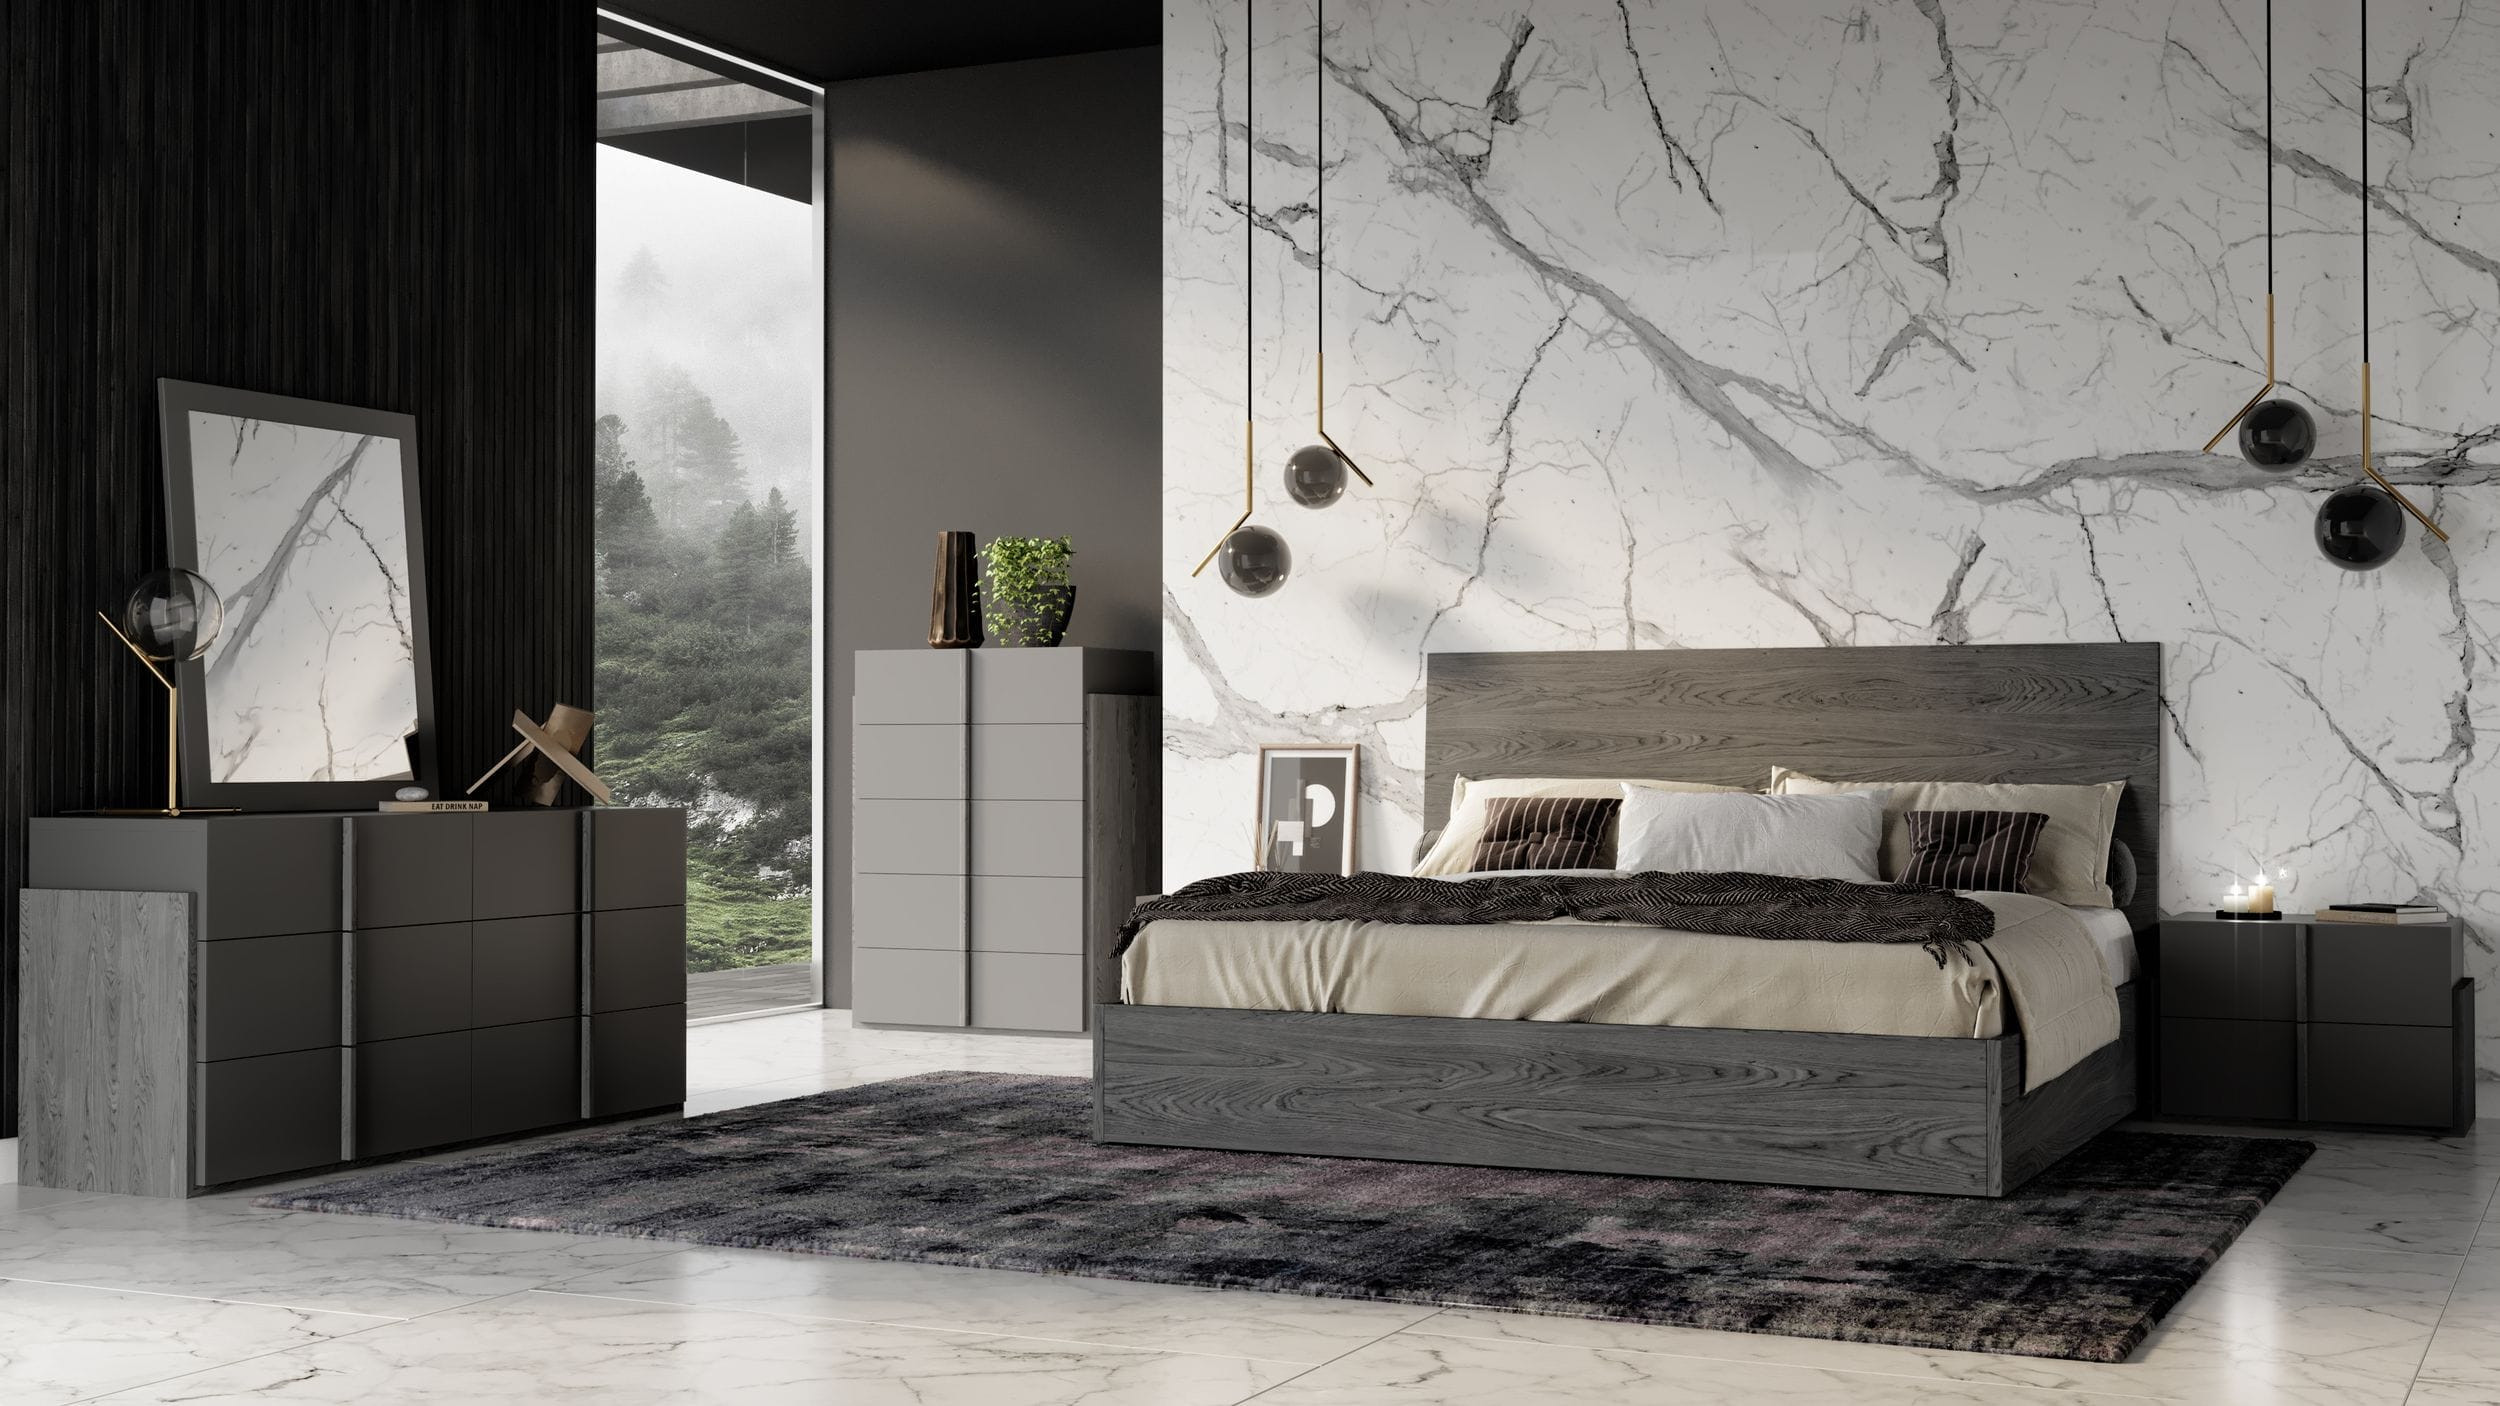 California King Modern Bedroom Furniture Sets Store Buy Bedroom Sets Affordable Prices